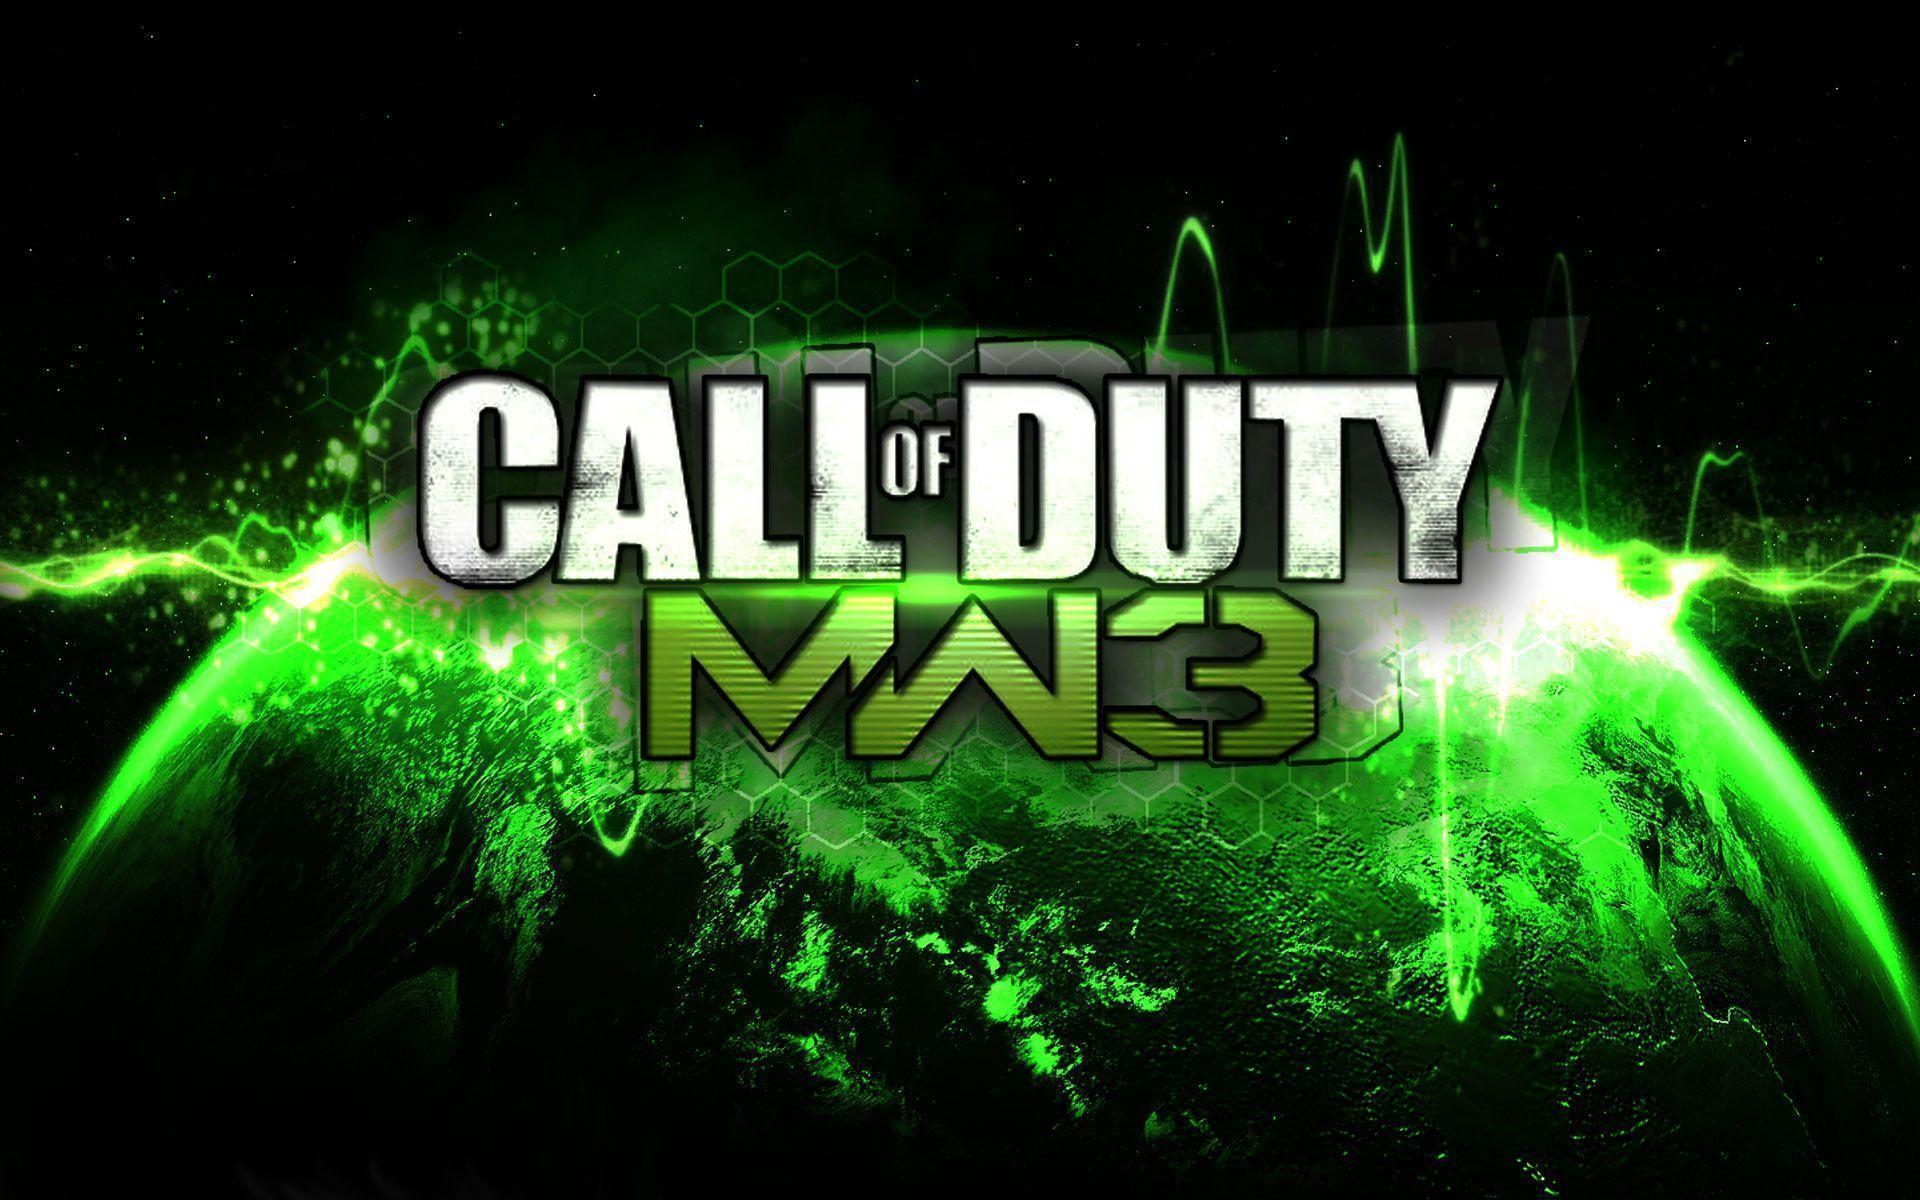 Call Of Duty Modern Warfare 3 Wallpaper 1920x1080 20372 Themeus